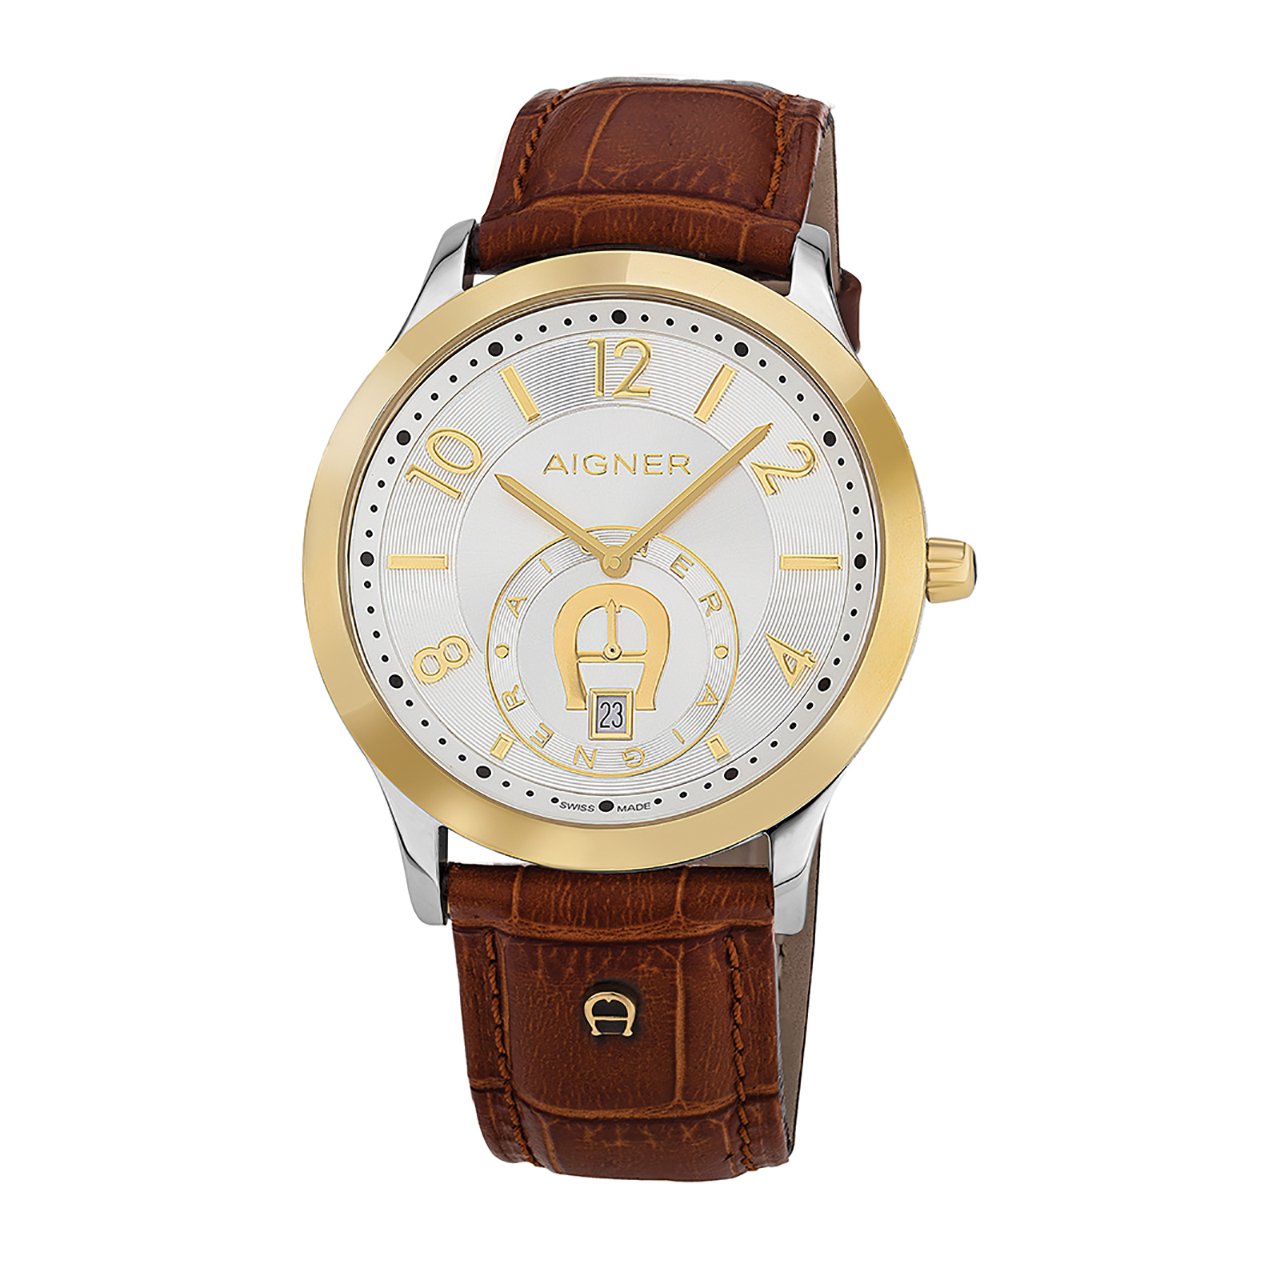 ساعت مچی عقربه ای مردانه اگنر مدل A44105 47